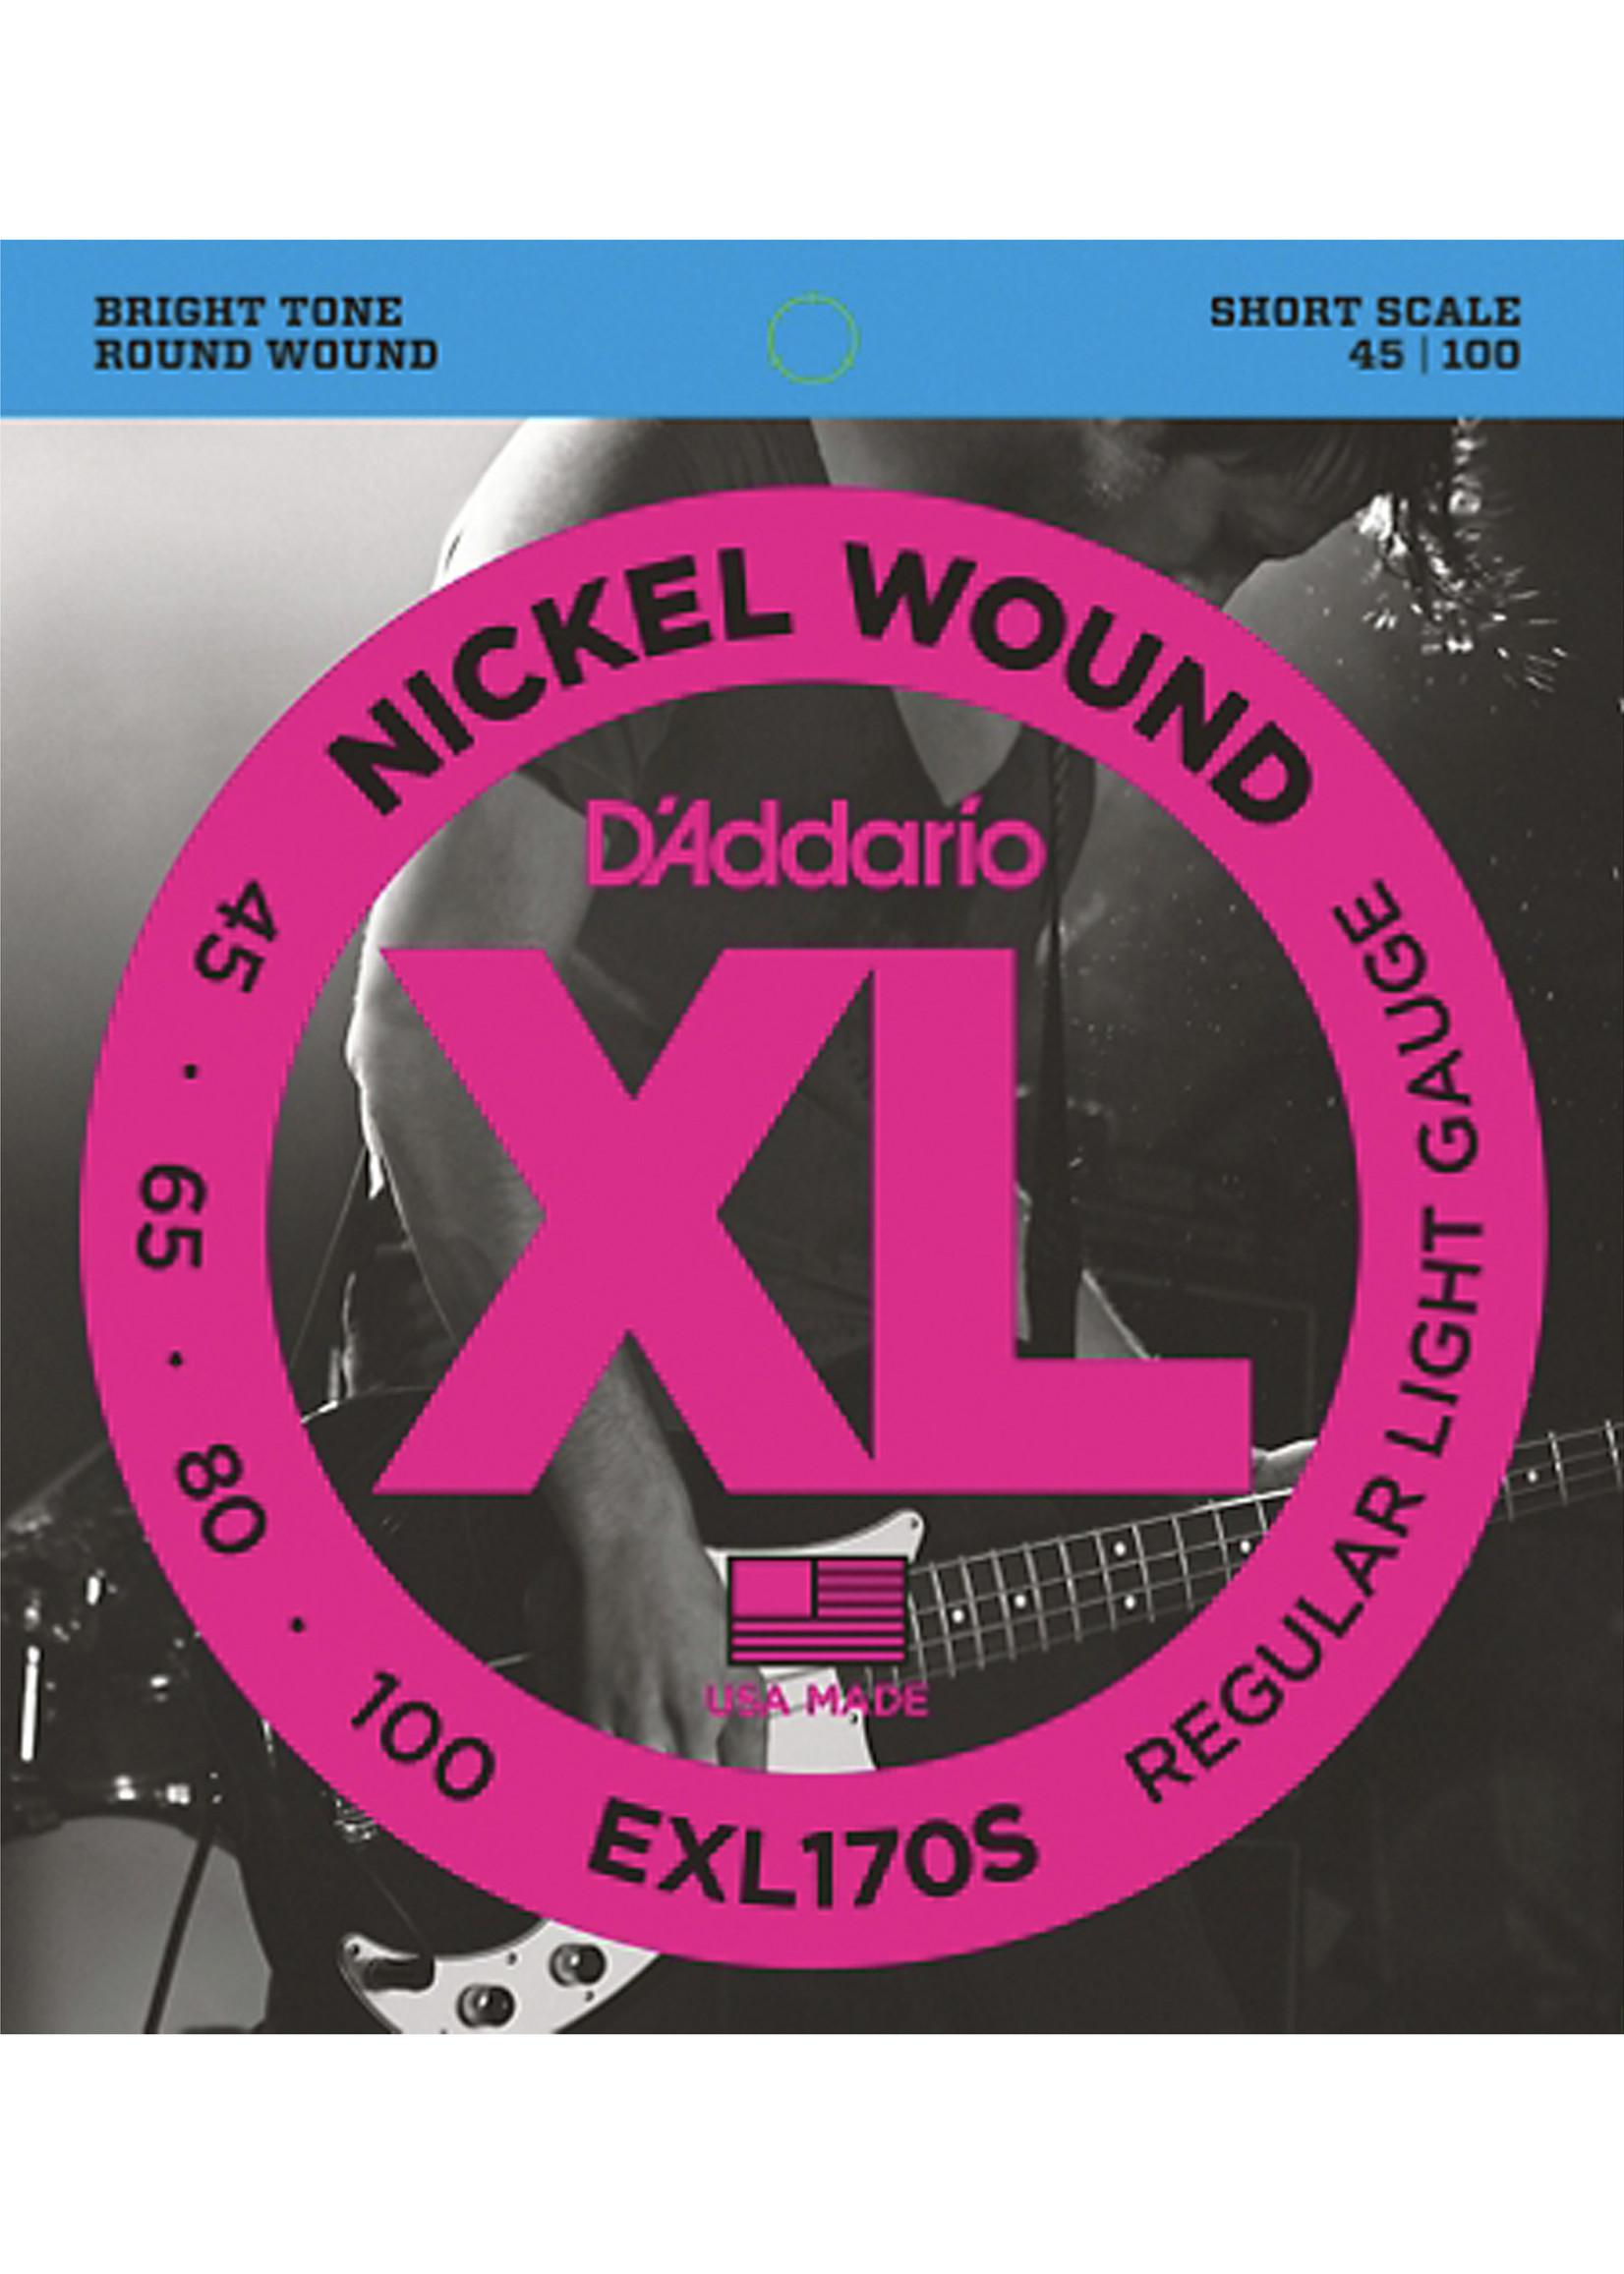 DAddario Fretted D'Addario EXL-170S 45-100 Short Scale